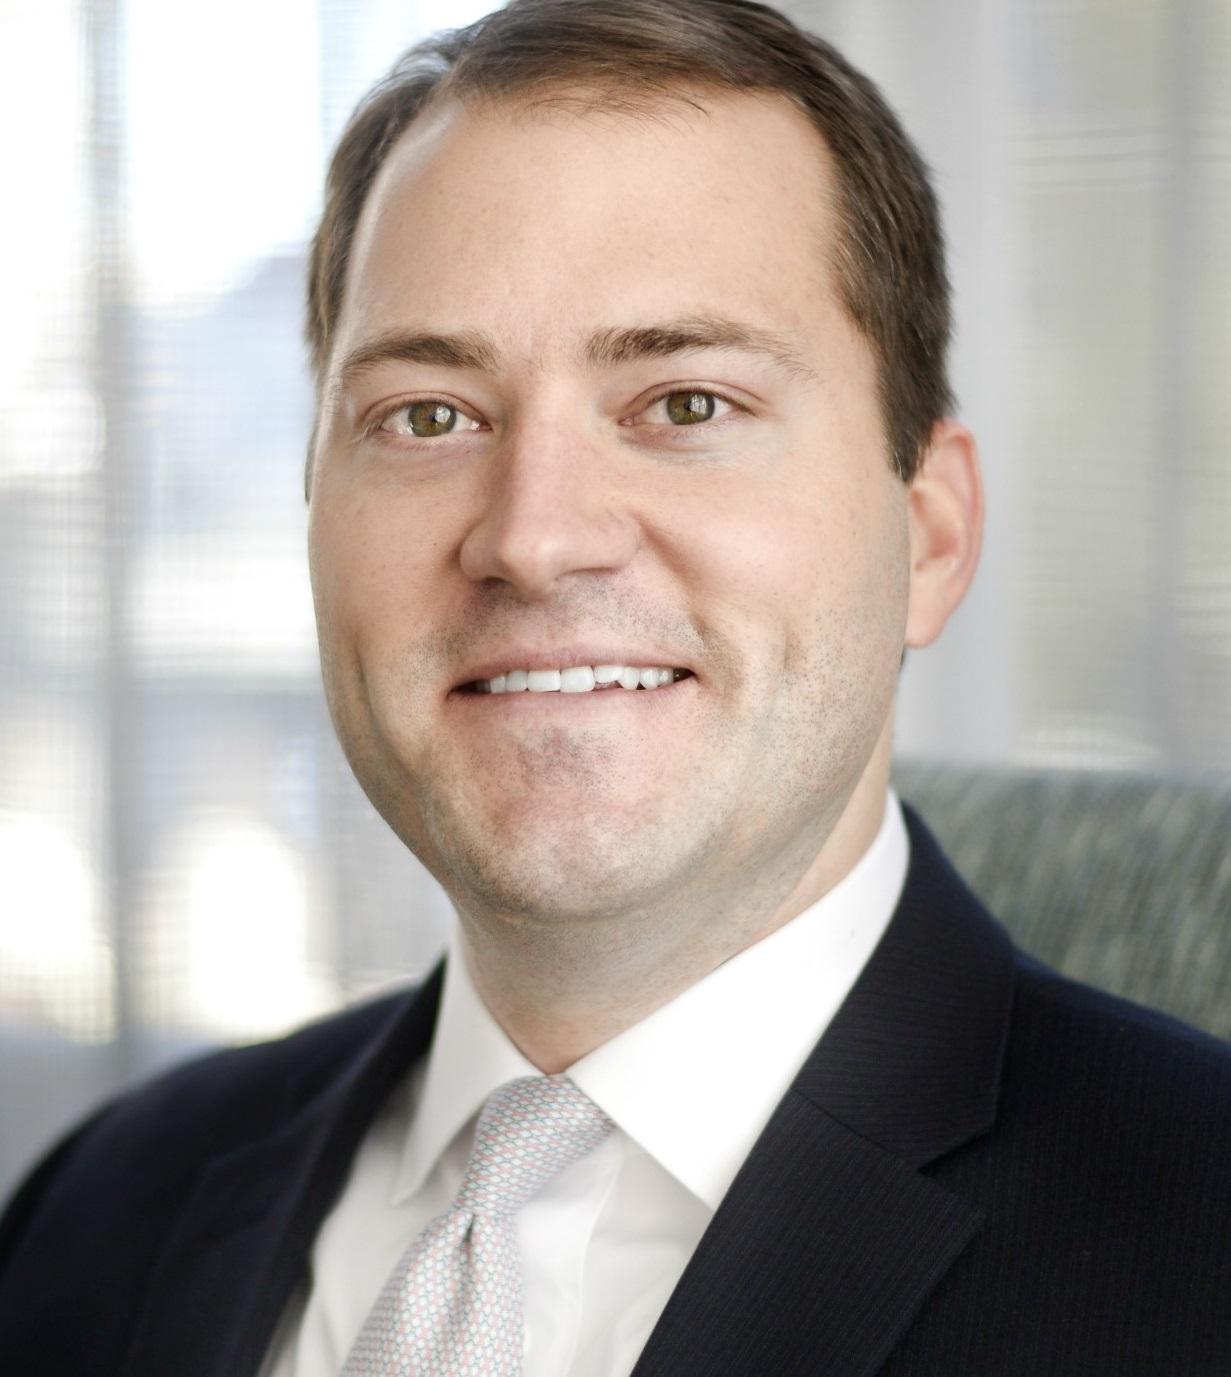 Michael Andrew Hart